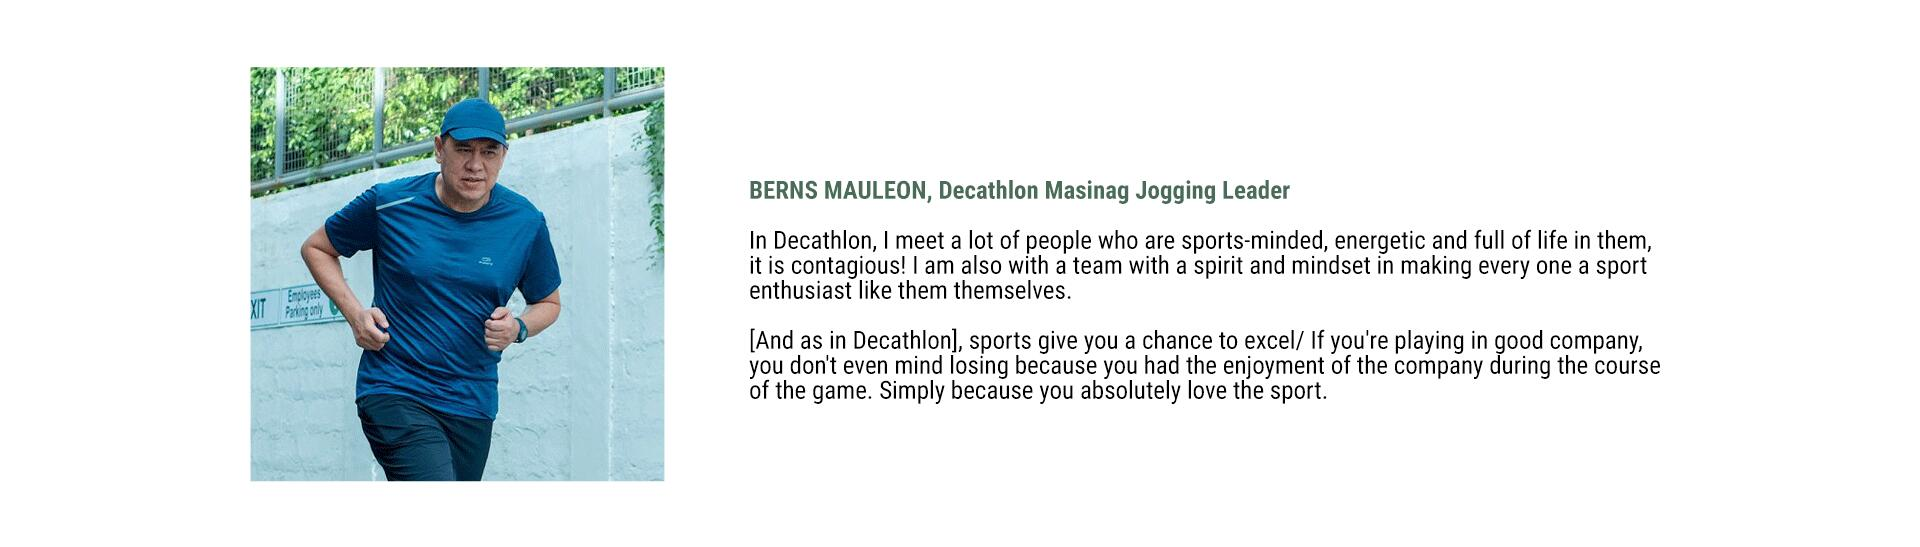 Decathlon Philippines Sustainability - Berns Mauleon